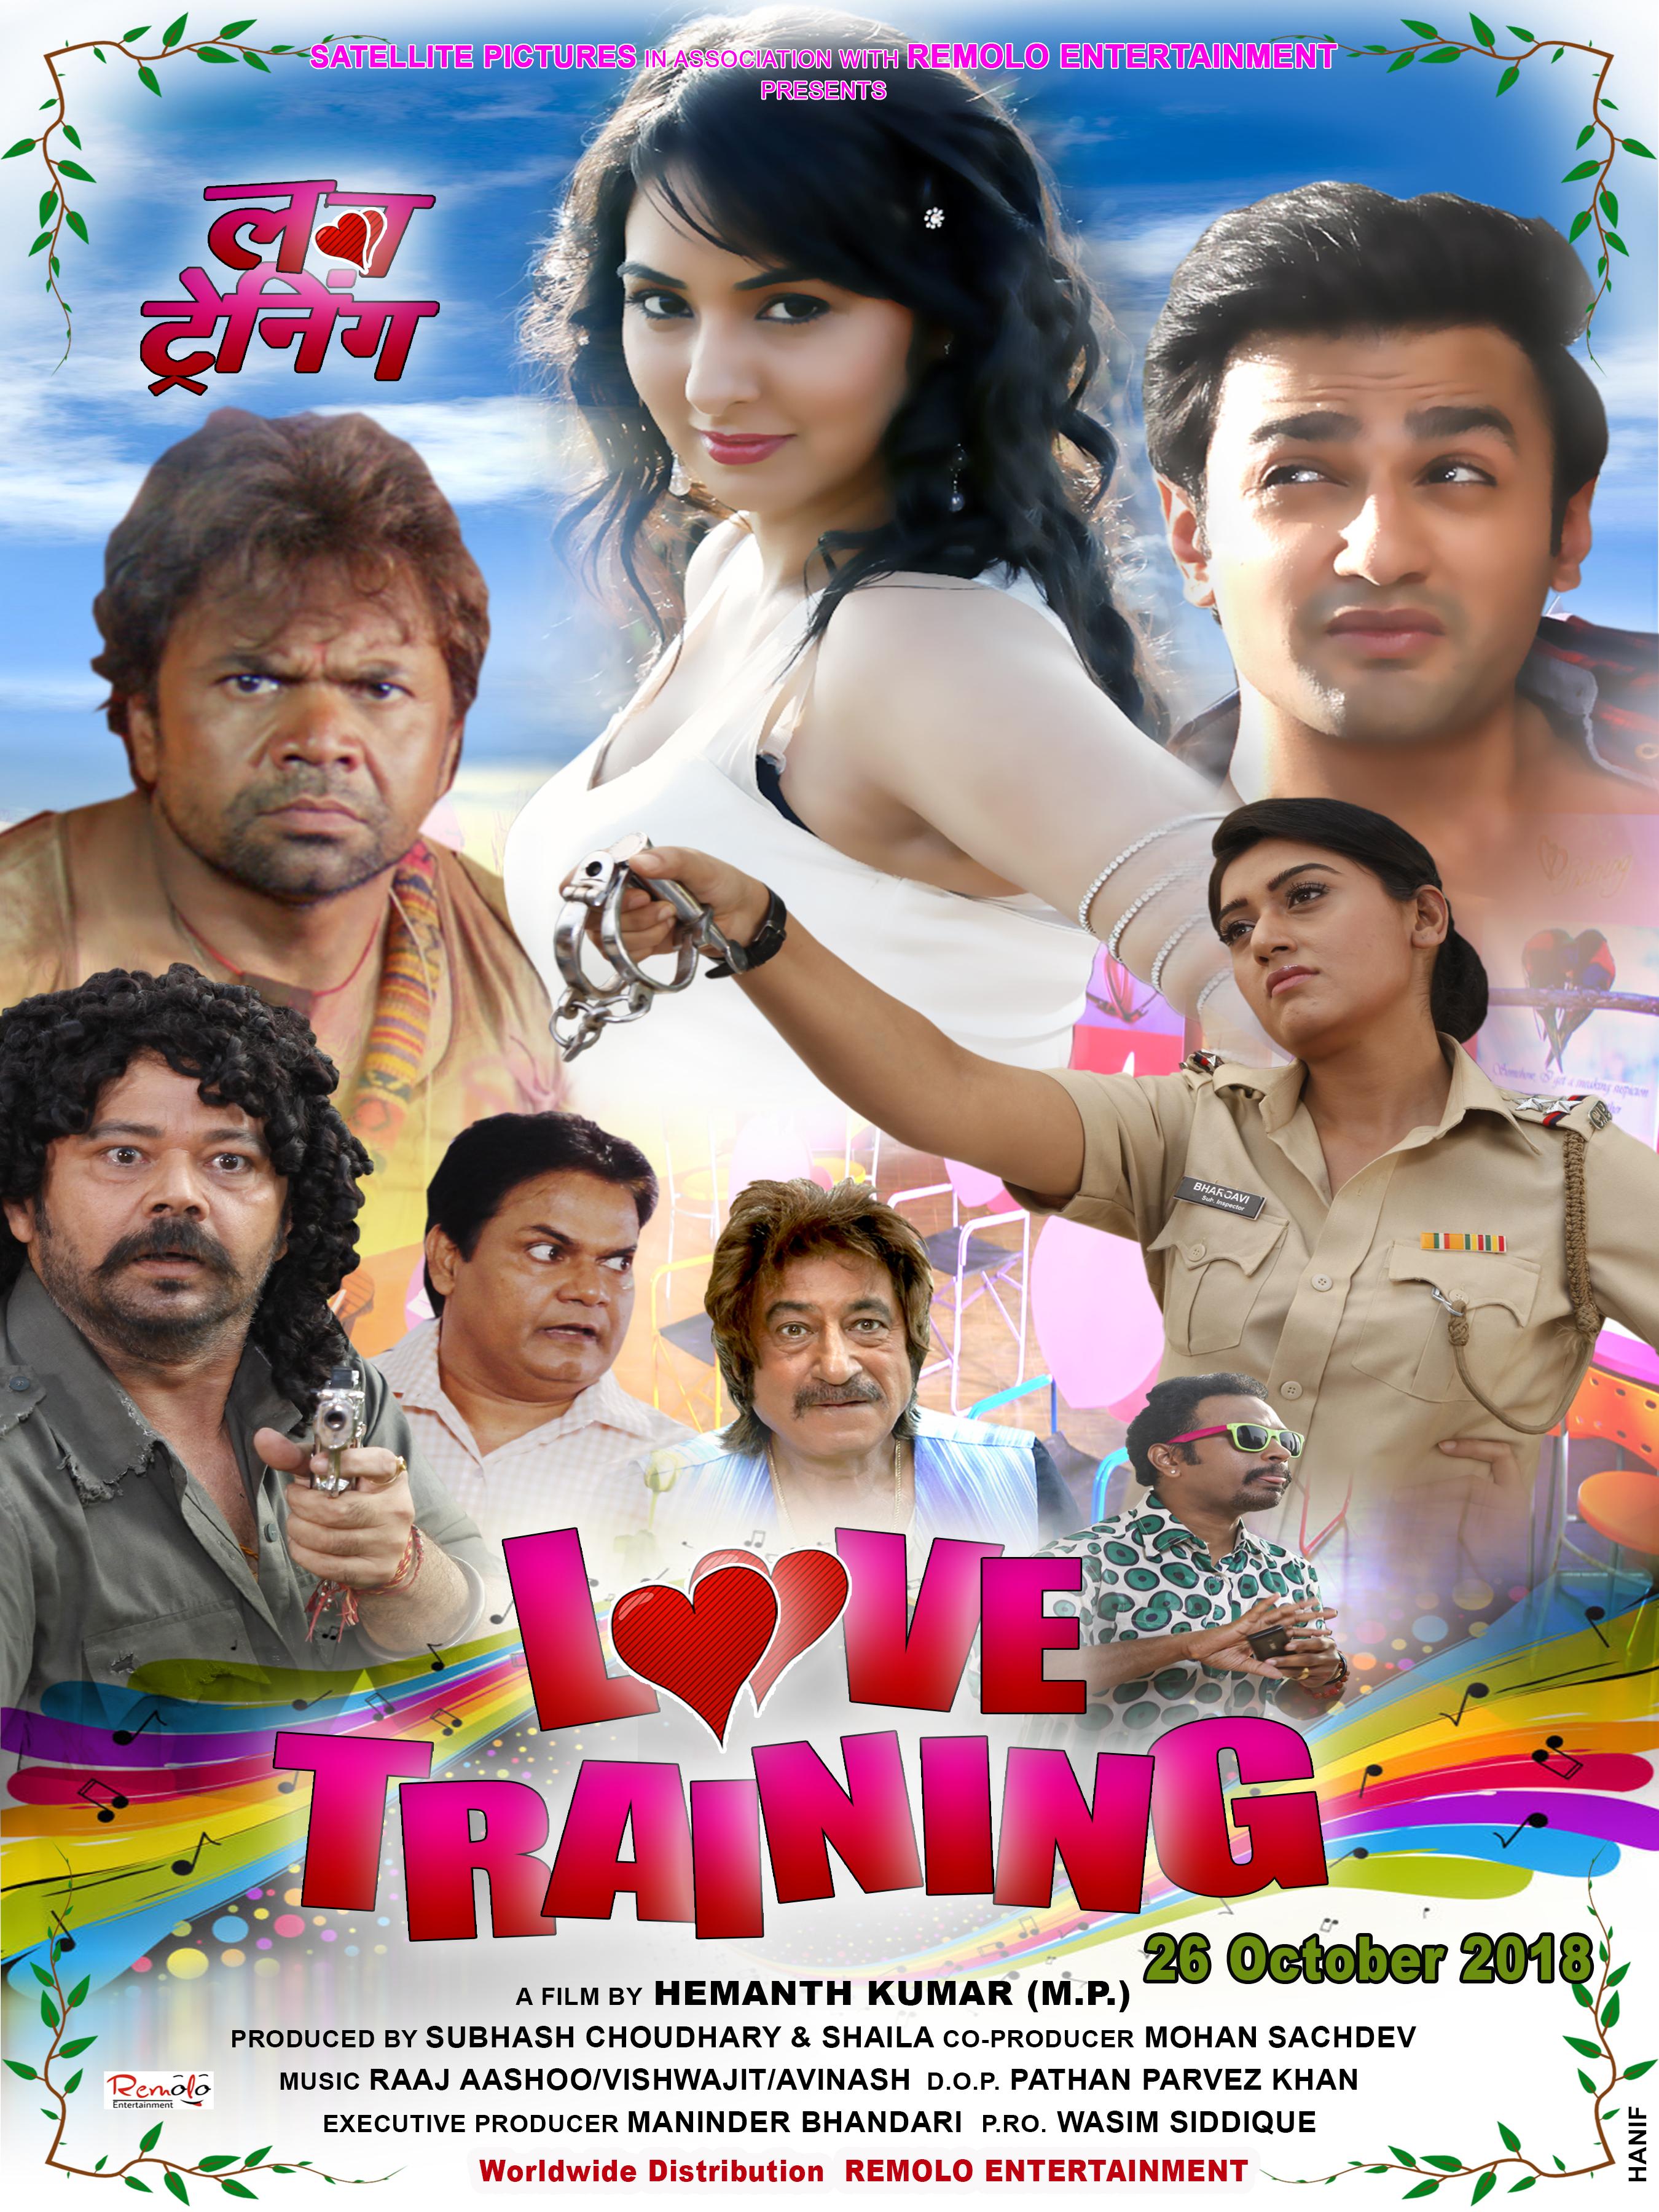 LOVE TRAINING (2018) MOVIE BLURAY Hindi HD AUDIO 720p [1GB] mkv